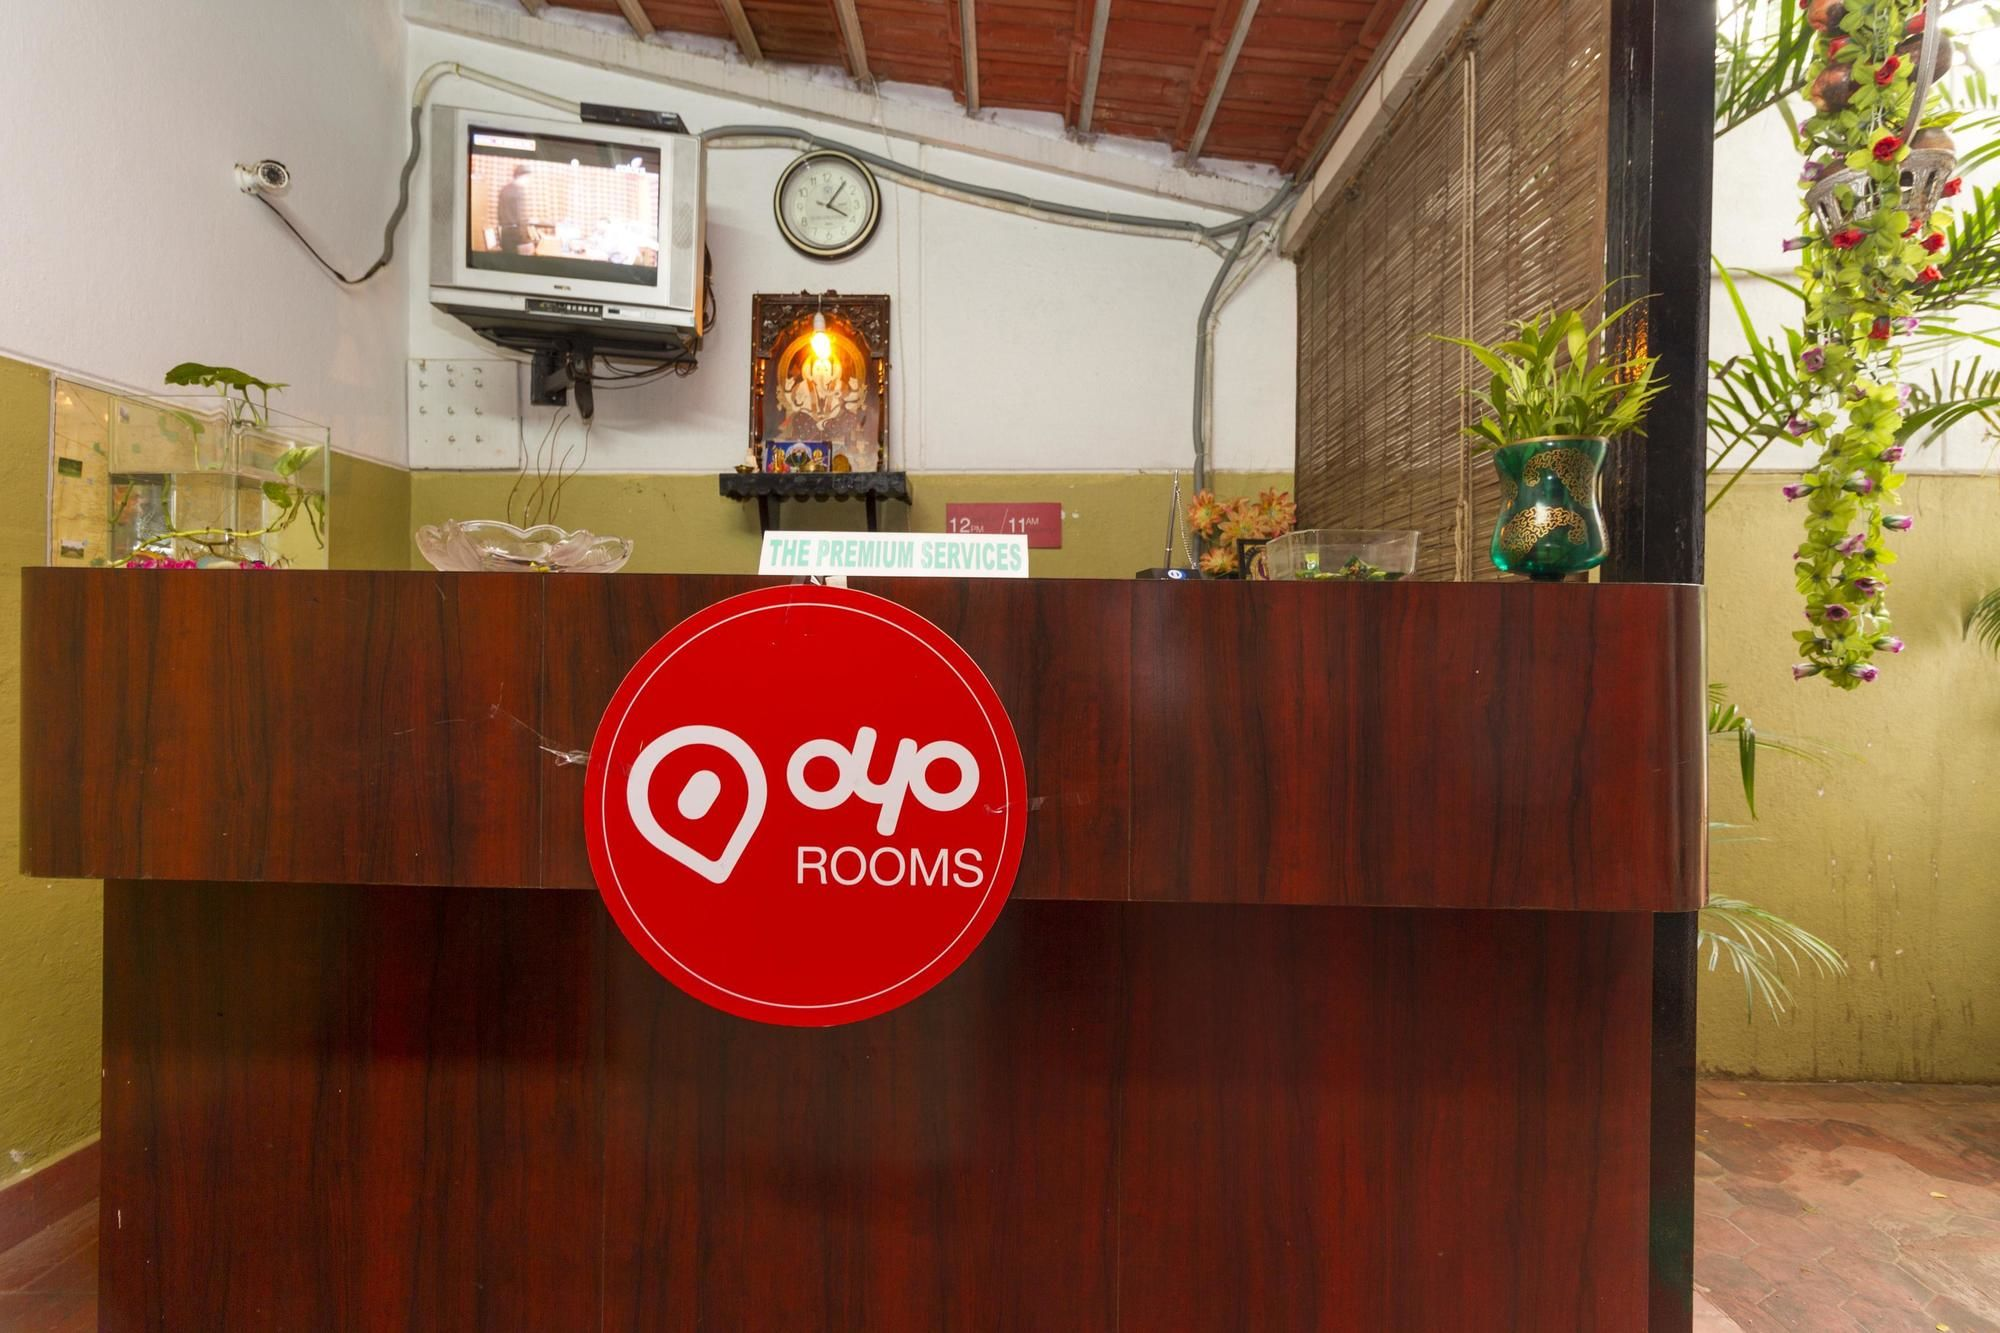 Oyo Apartments 12Th A Main Indiranagar